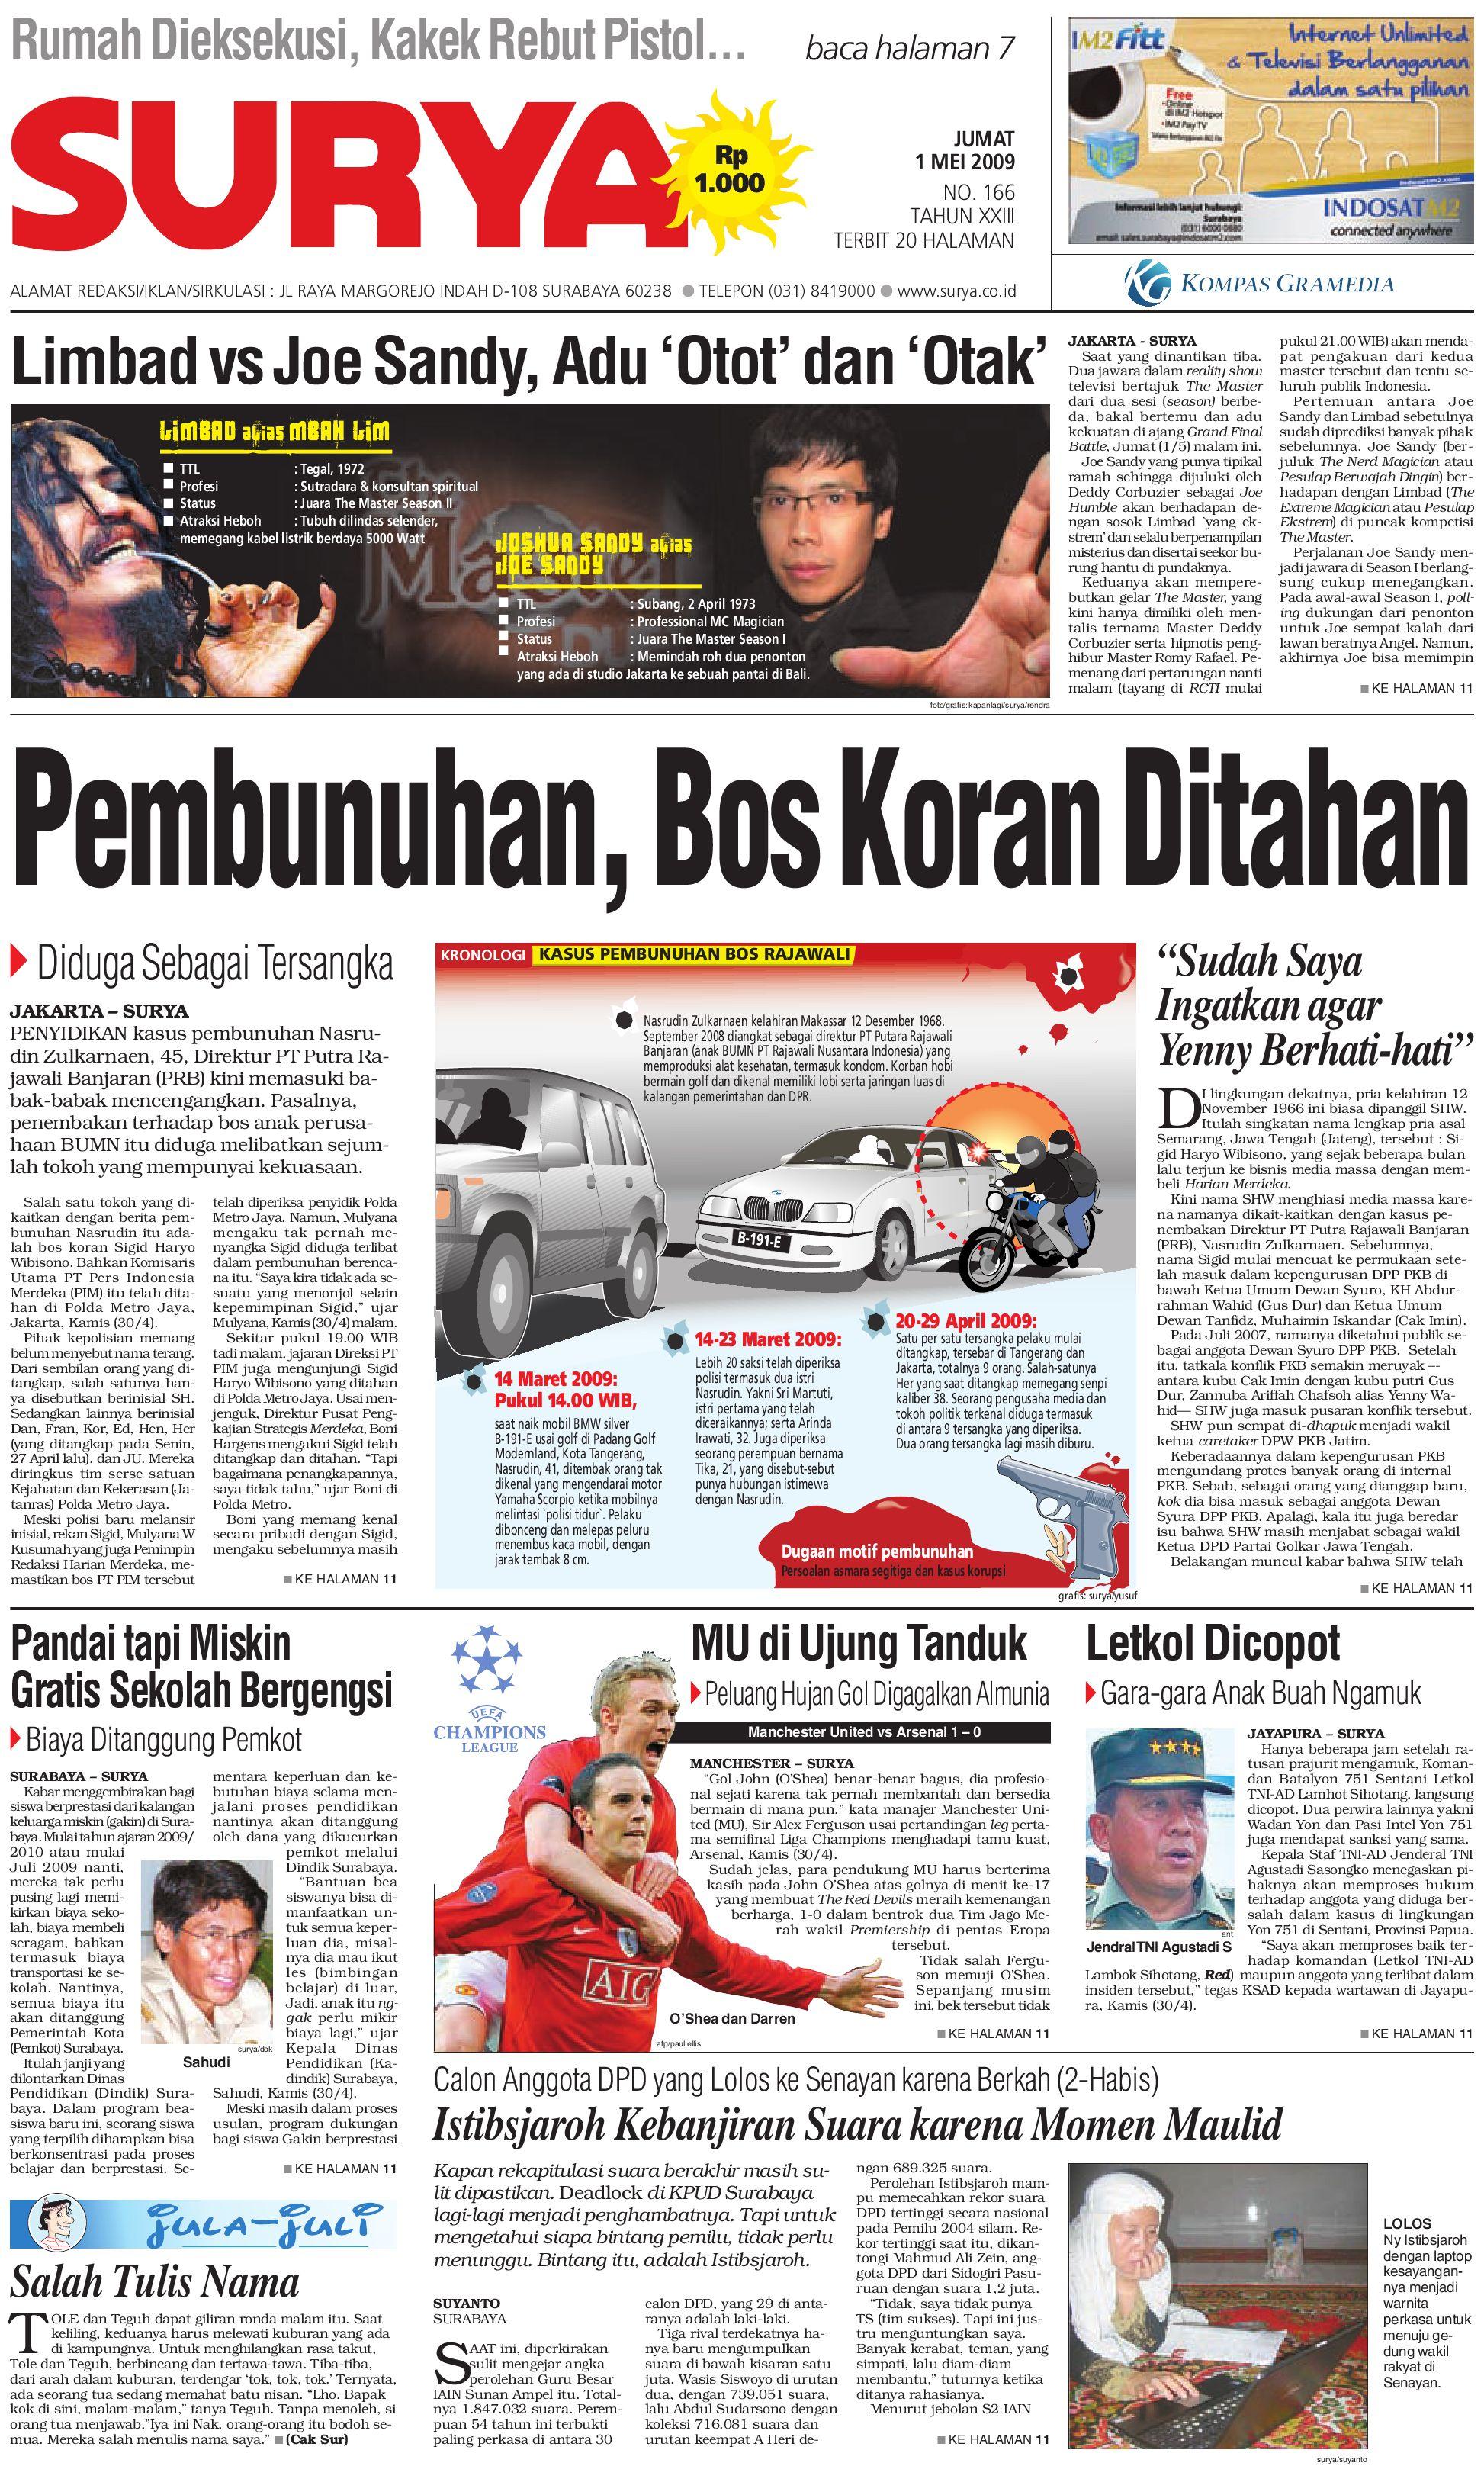 Surya Edisi cetal 01 Mei 2009 by Harian SURYA - issuu 2e332ed392